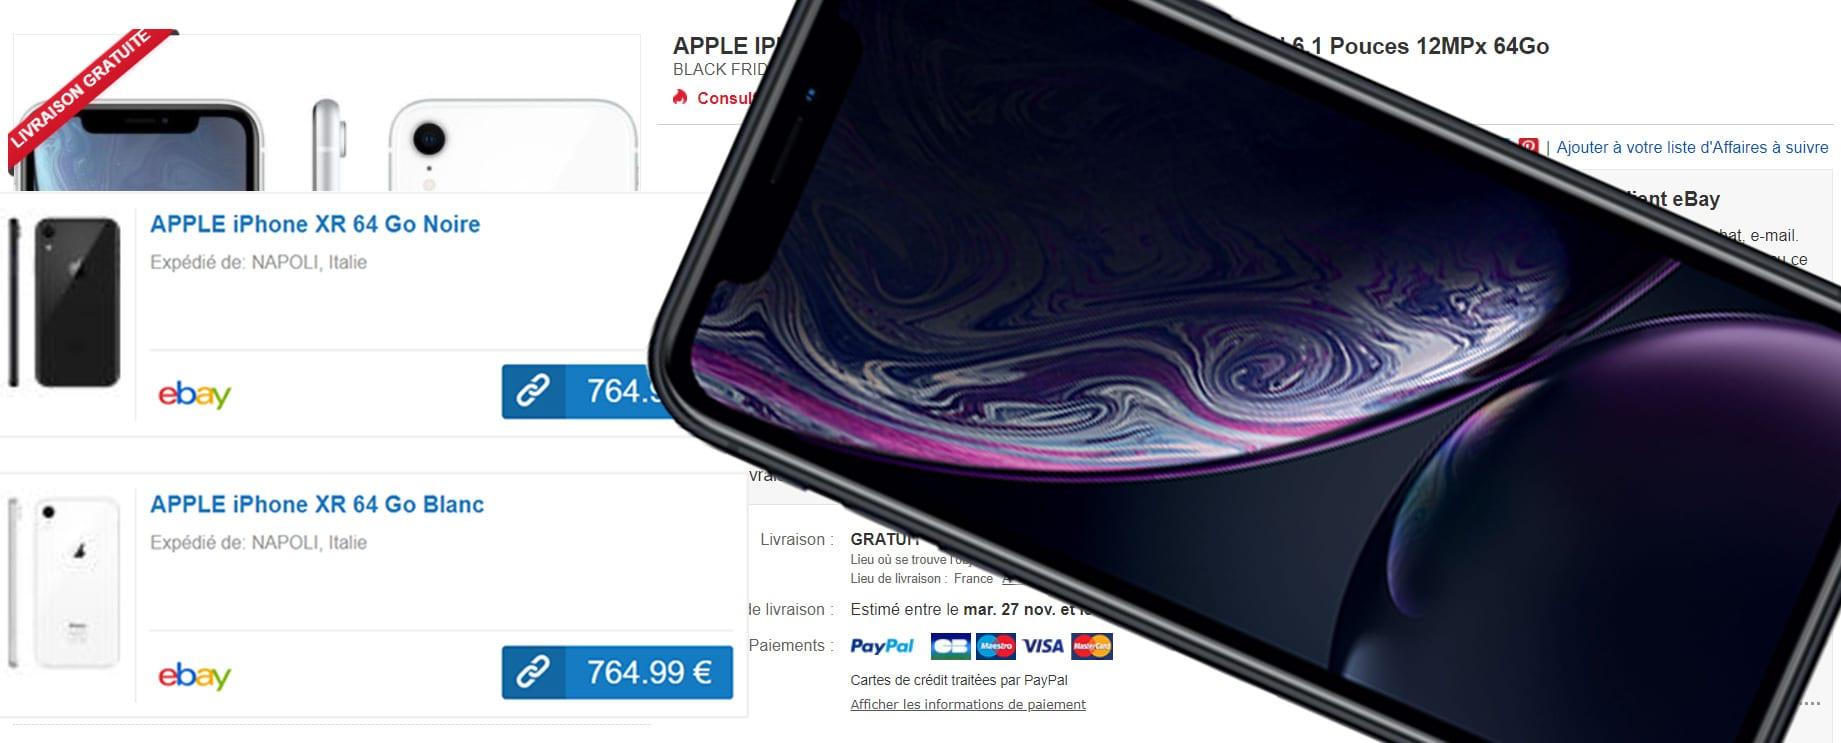 APPLE IPHONE XR à 765 Euros! BLACK FRIDAY 2018